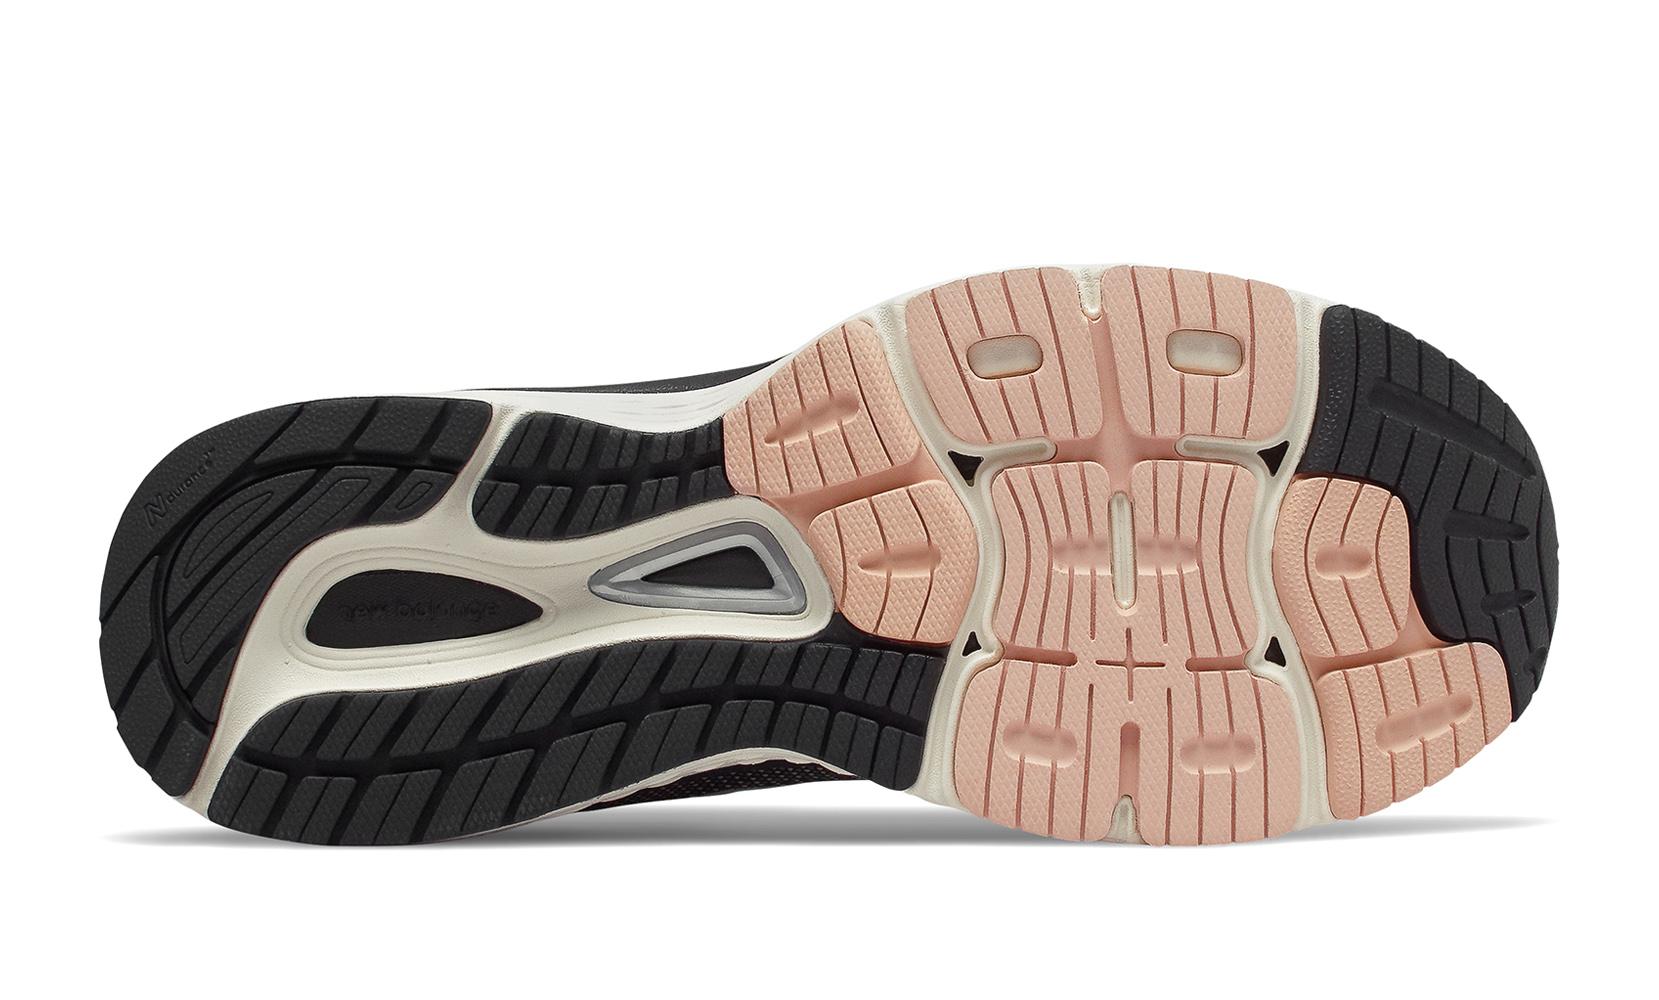 Жіноче взуття для бігу New Balance 880v9 GTX W880GT9 | New Balance